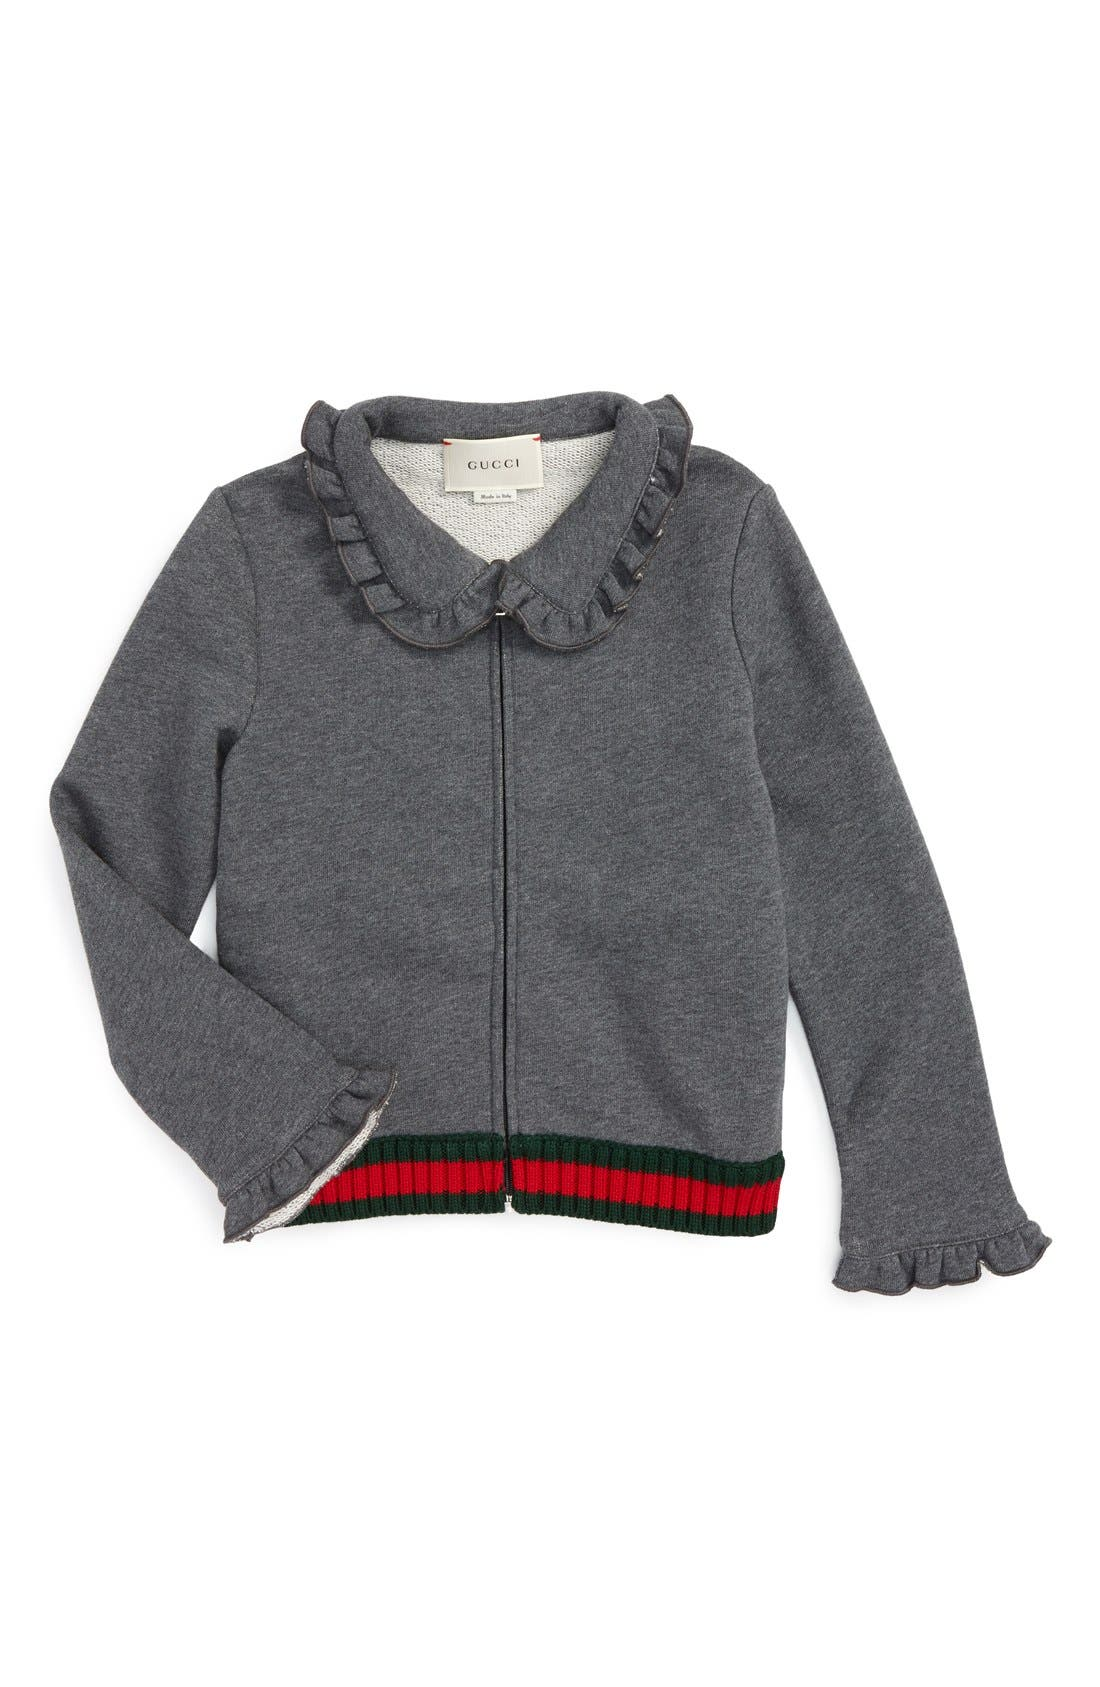 GUCCI KIDSWEAR Gucci Zip Sweatshirt